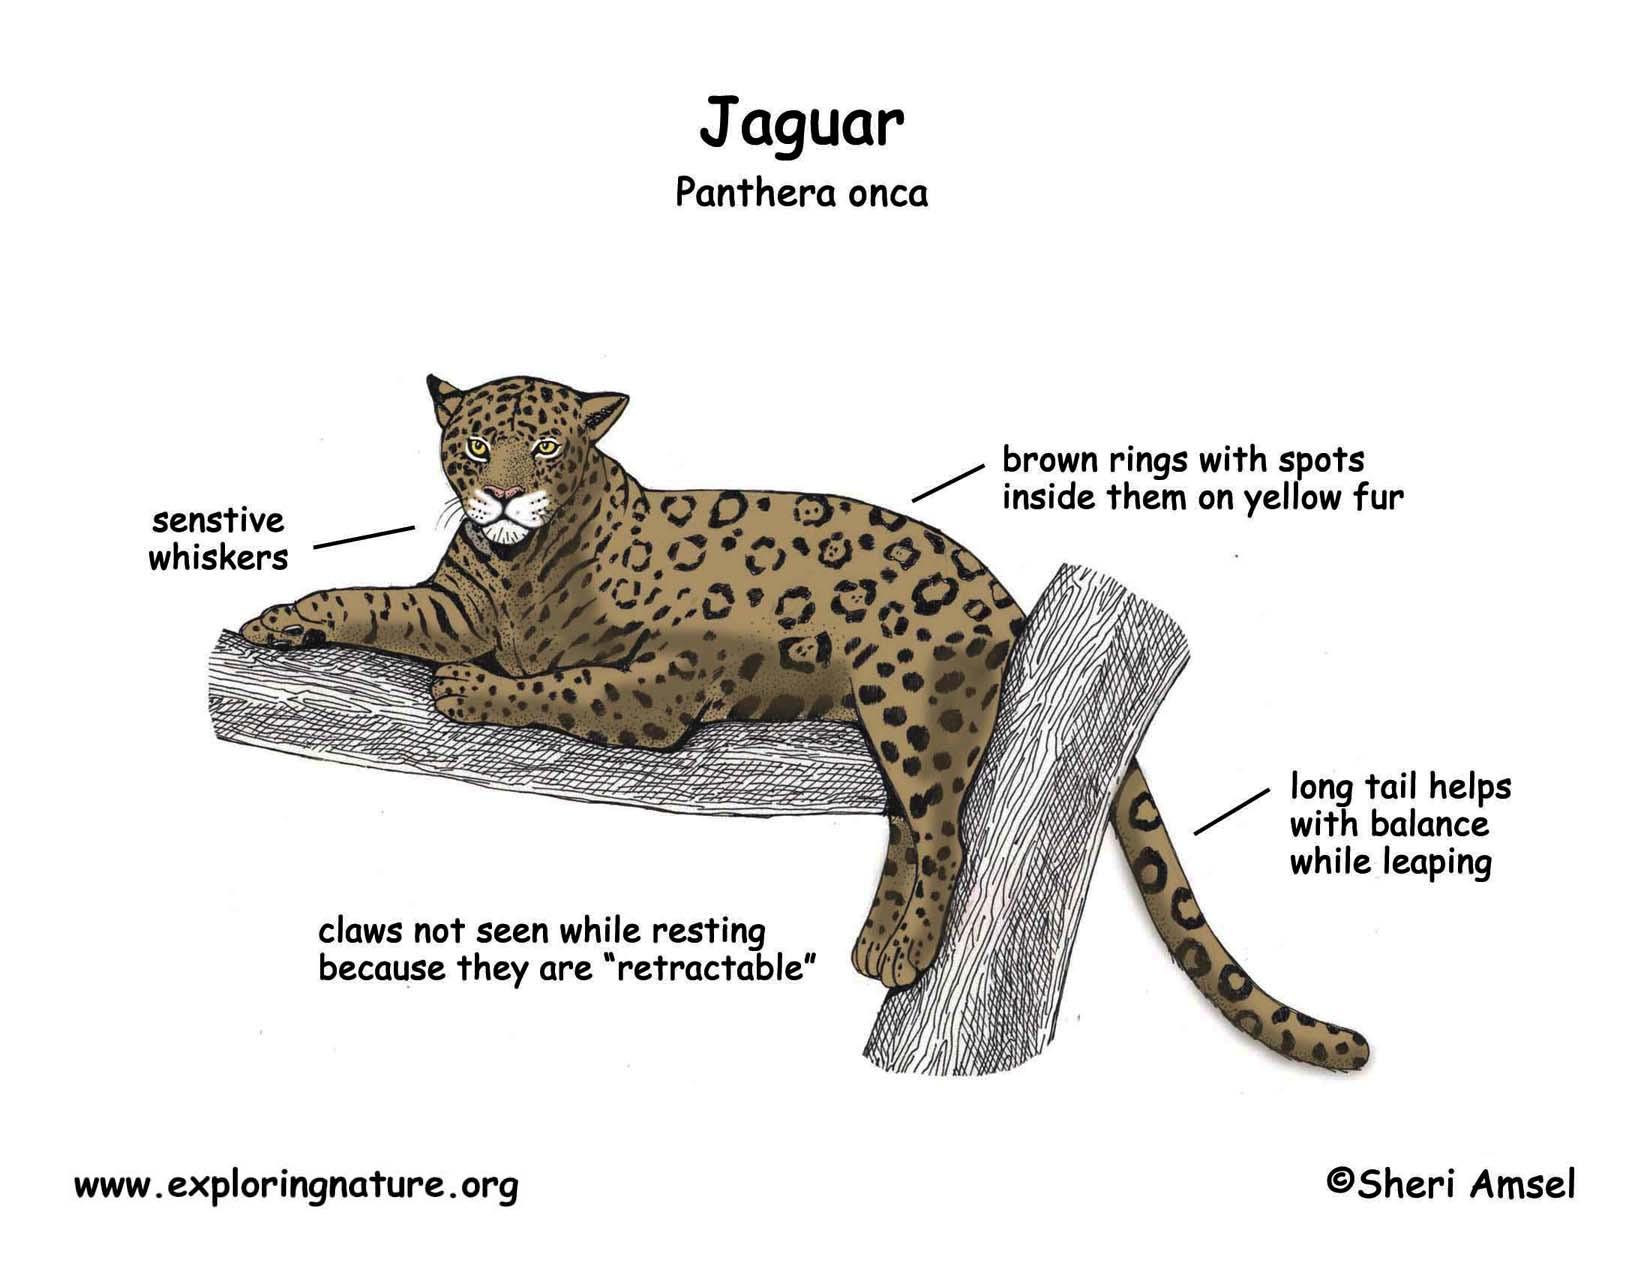 jaguar animal life cycle year of clean water Diagram of Common Bat Diagram Of A Jaguar Animal #14